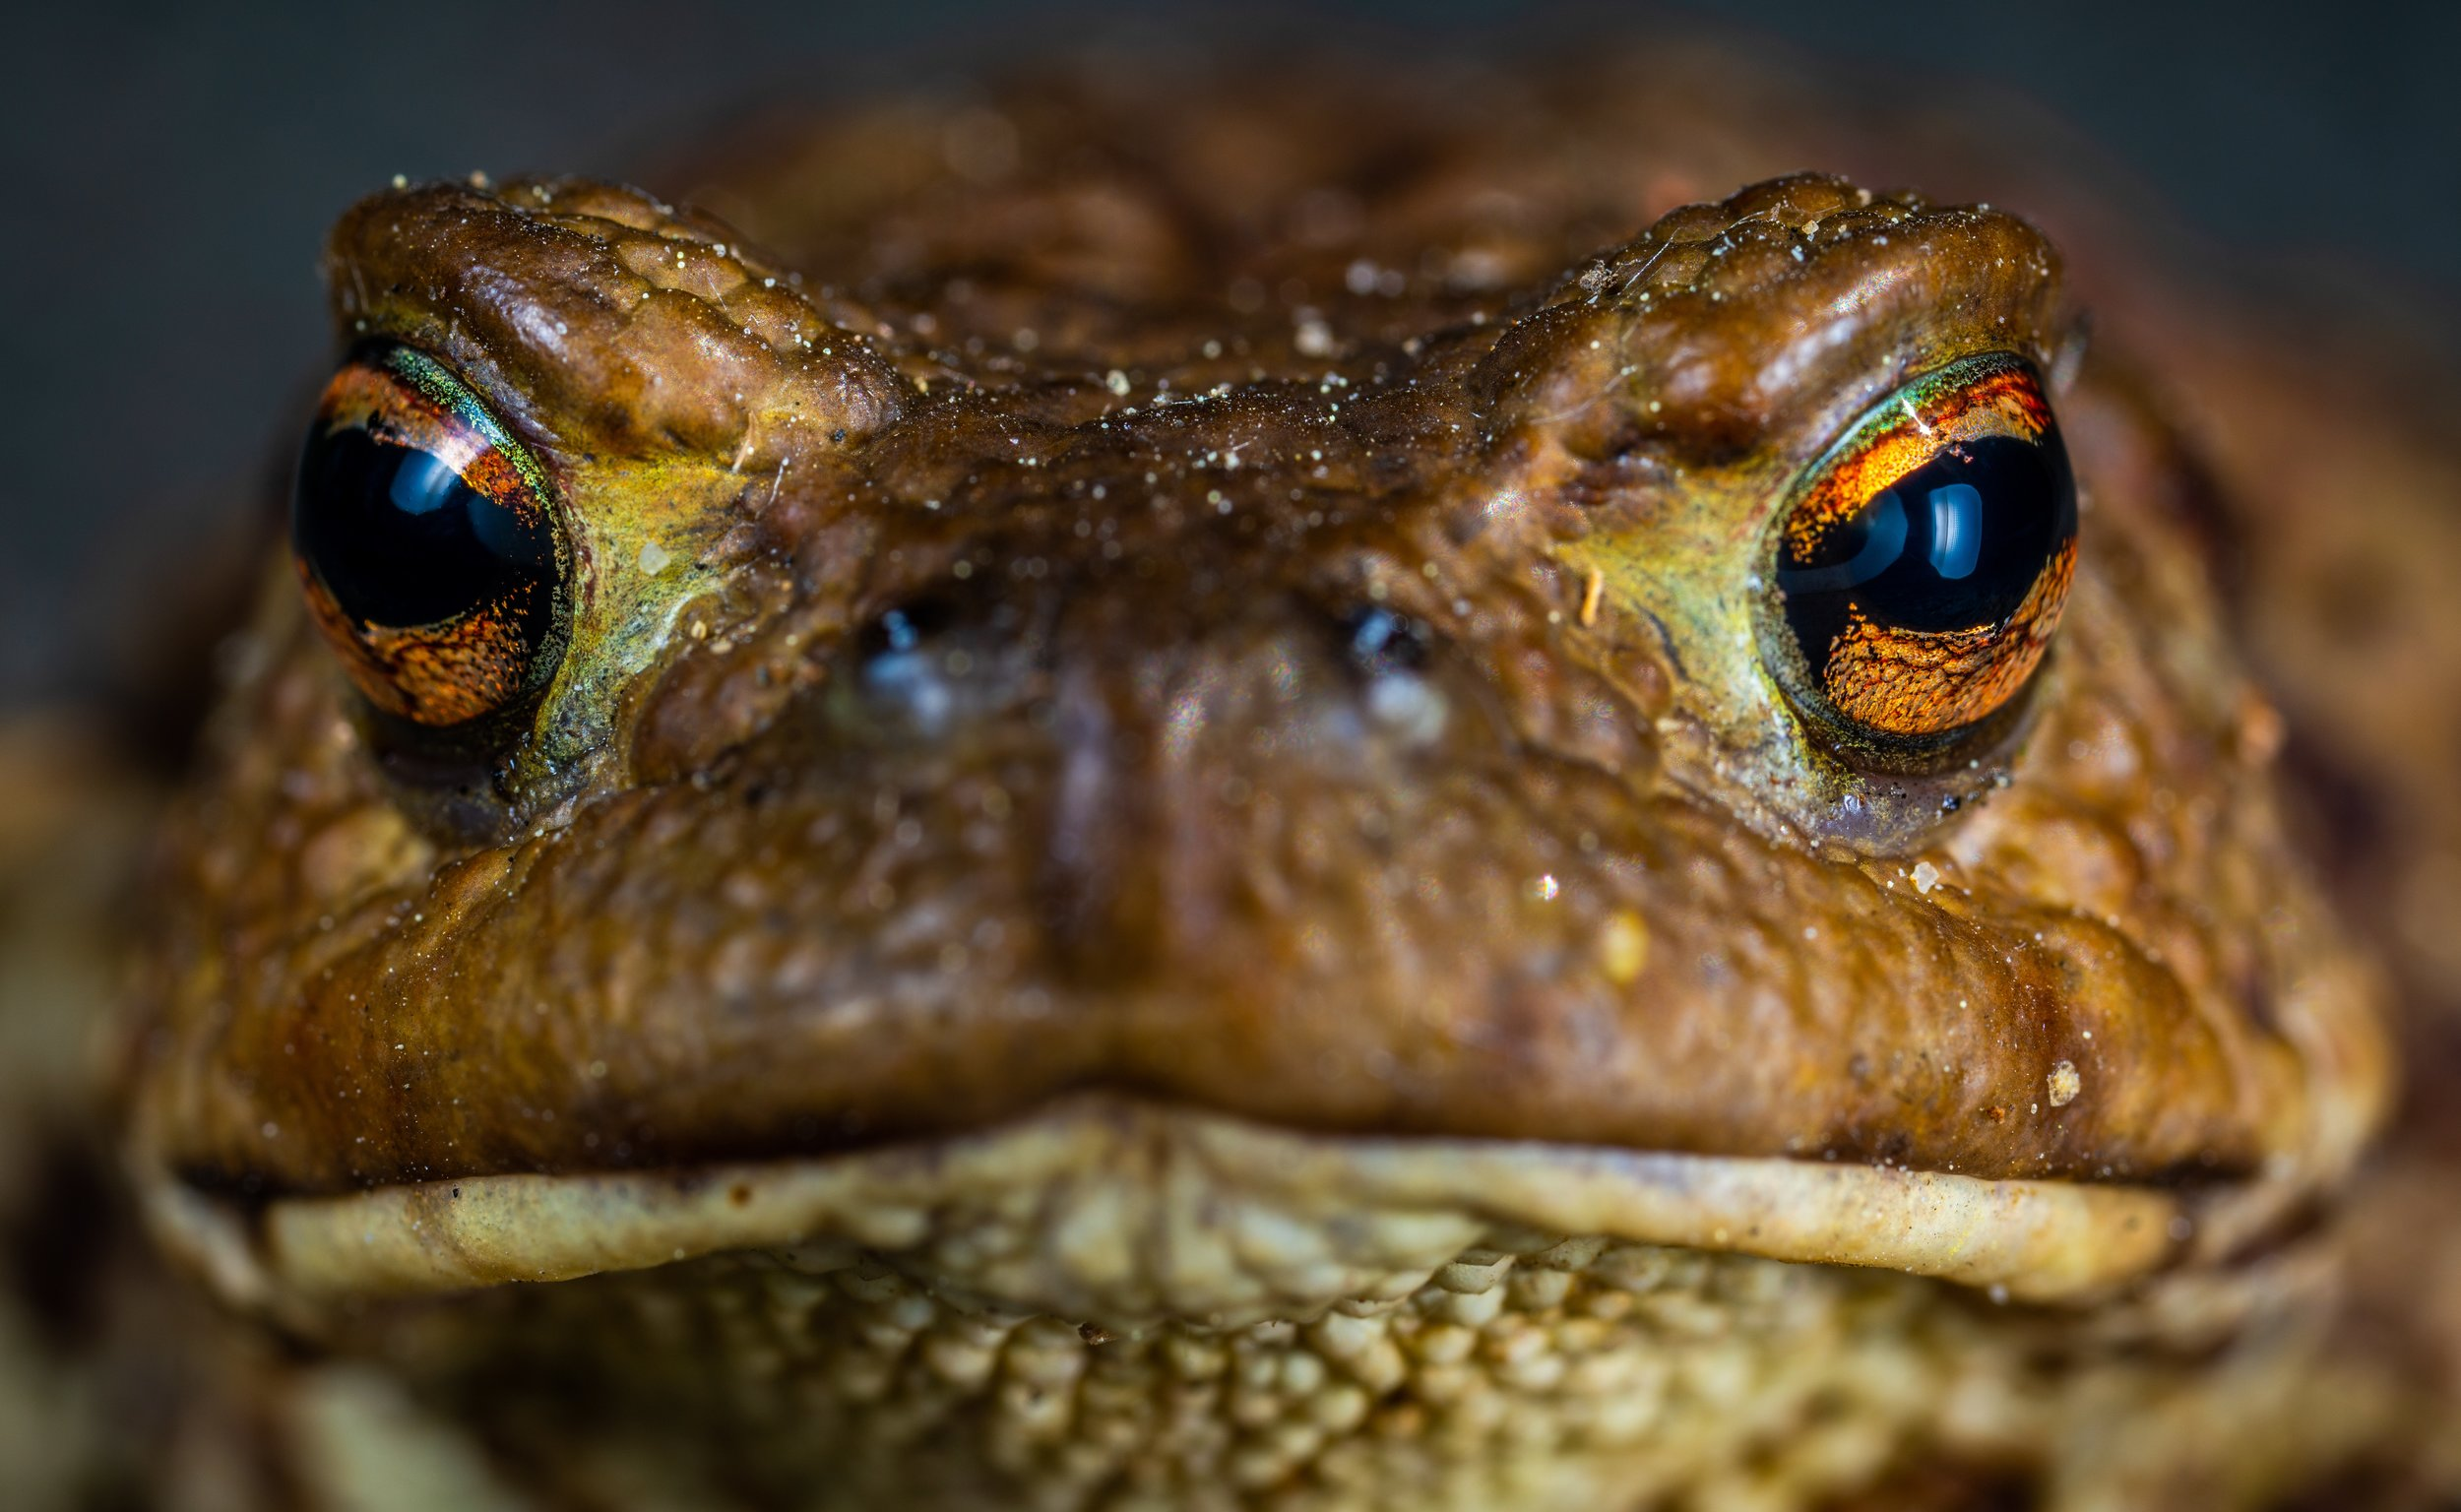 amphibian-animal-aquatic-1101196.jpg